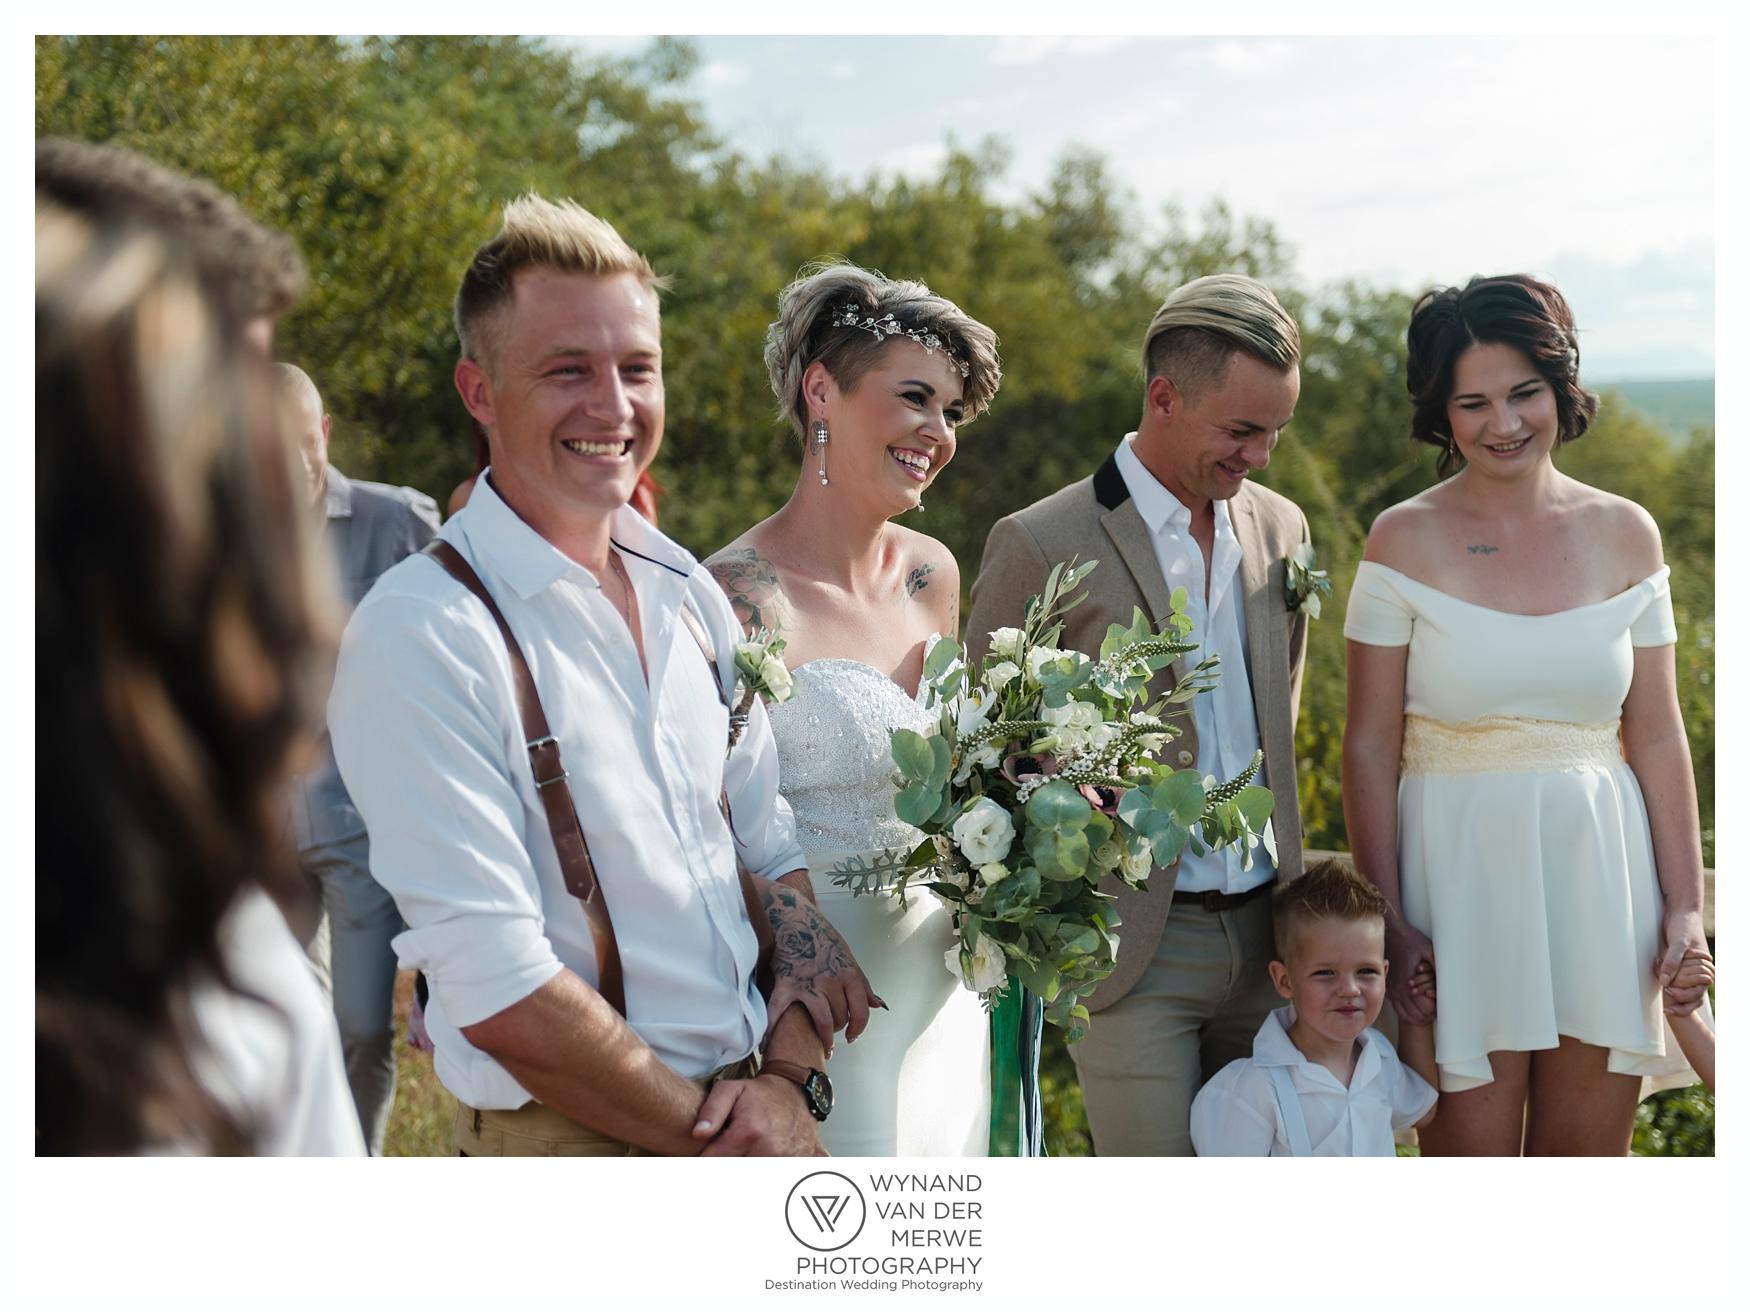 WynandvanderMerwe_weddingphotography_bushveldwedding_northam_bushveld_limpopowedding_limpopo_southafrica-98.jpg